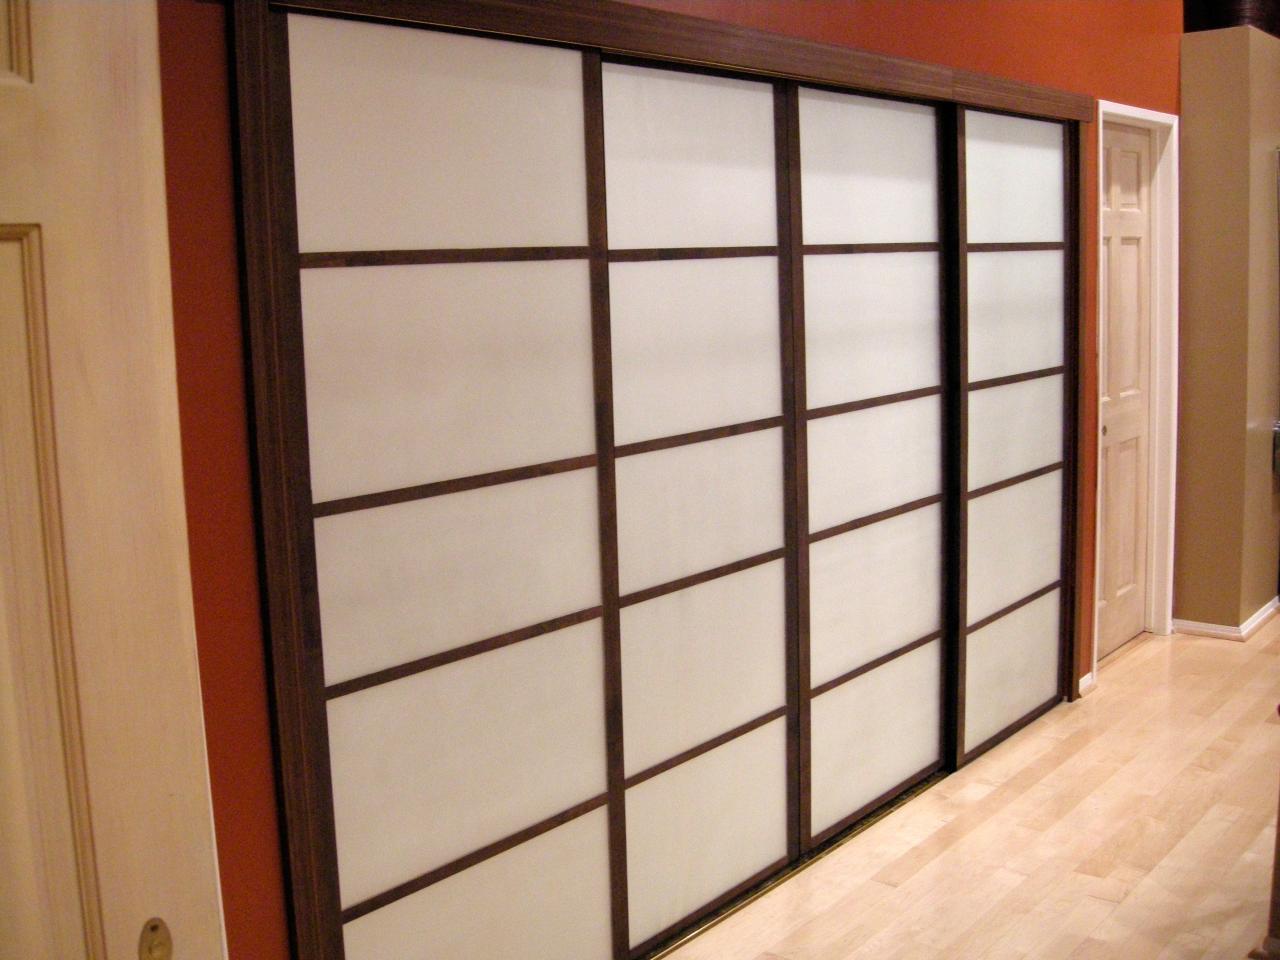 Shoji Screen Door Idea With Darker Brown Wood Frame